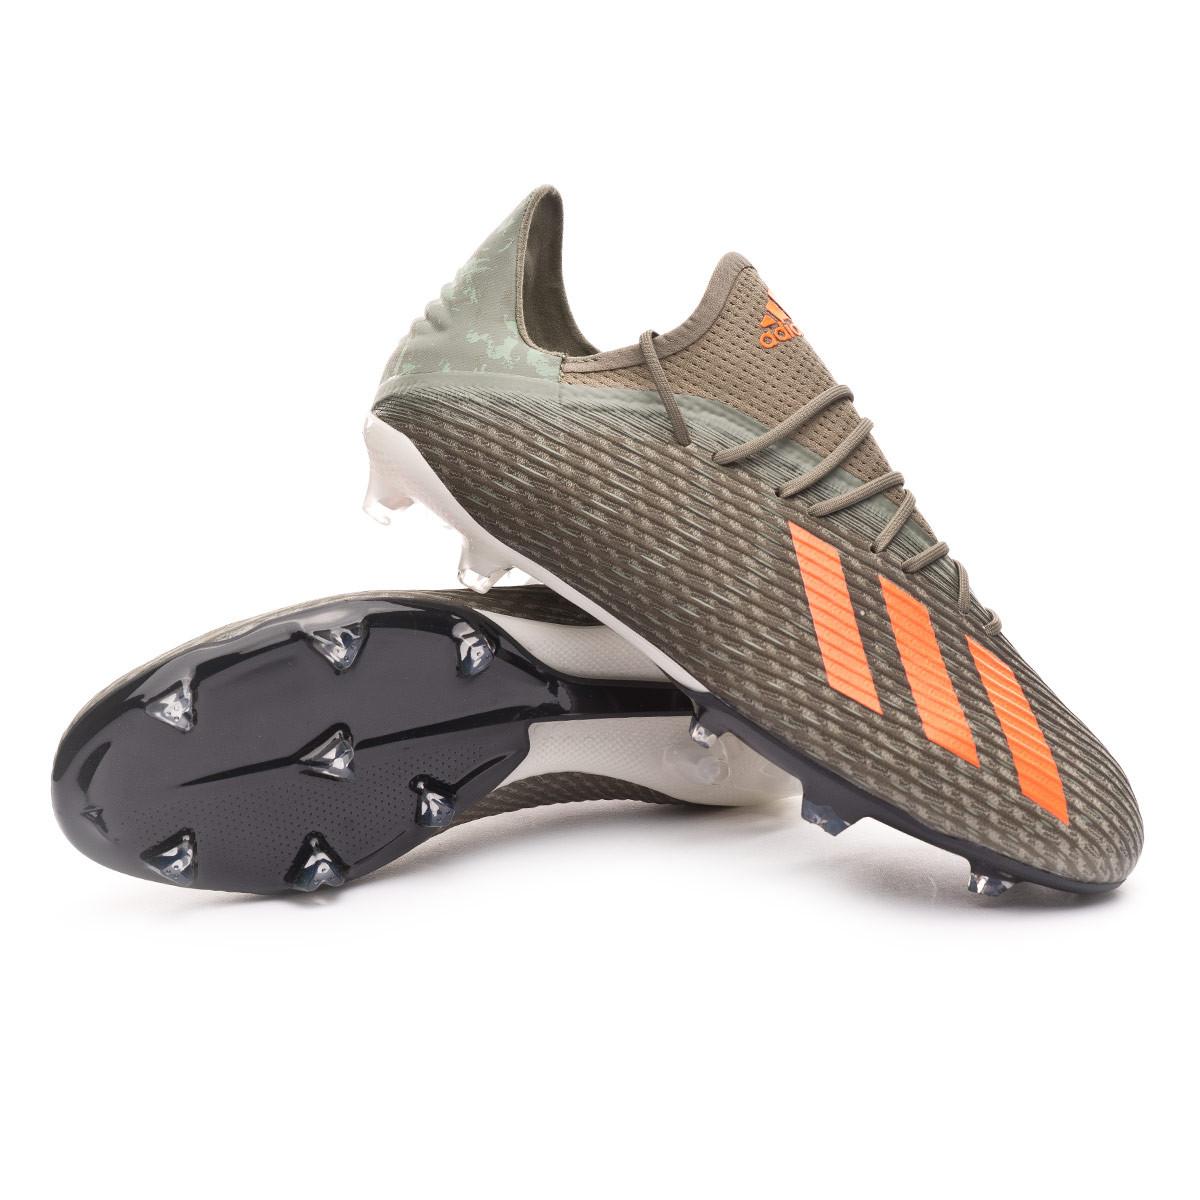 Chaussure de foot adidas X 19.2 FG